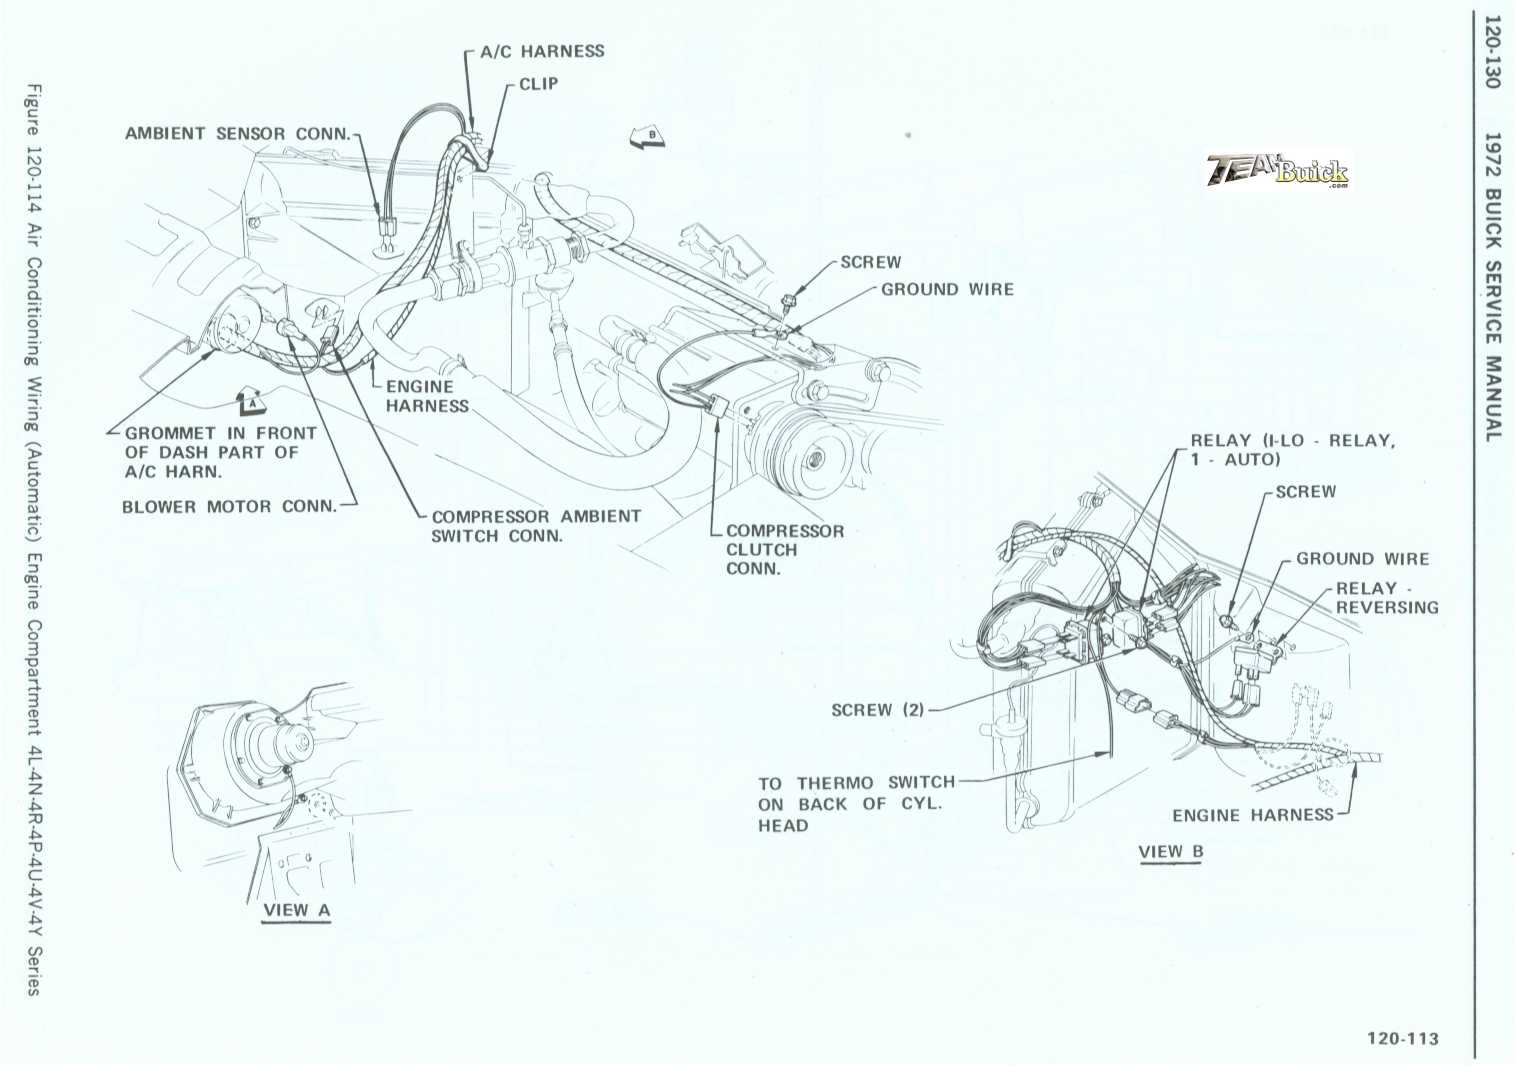 1972 buick skylark gs 1972 buick skylark wiring diagram 1972 buick skylark  fuel line diagram buick